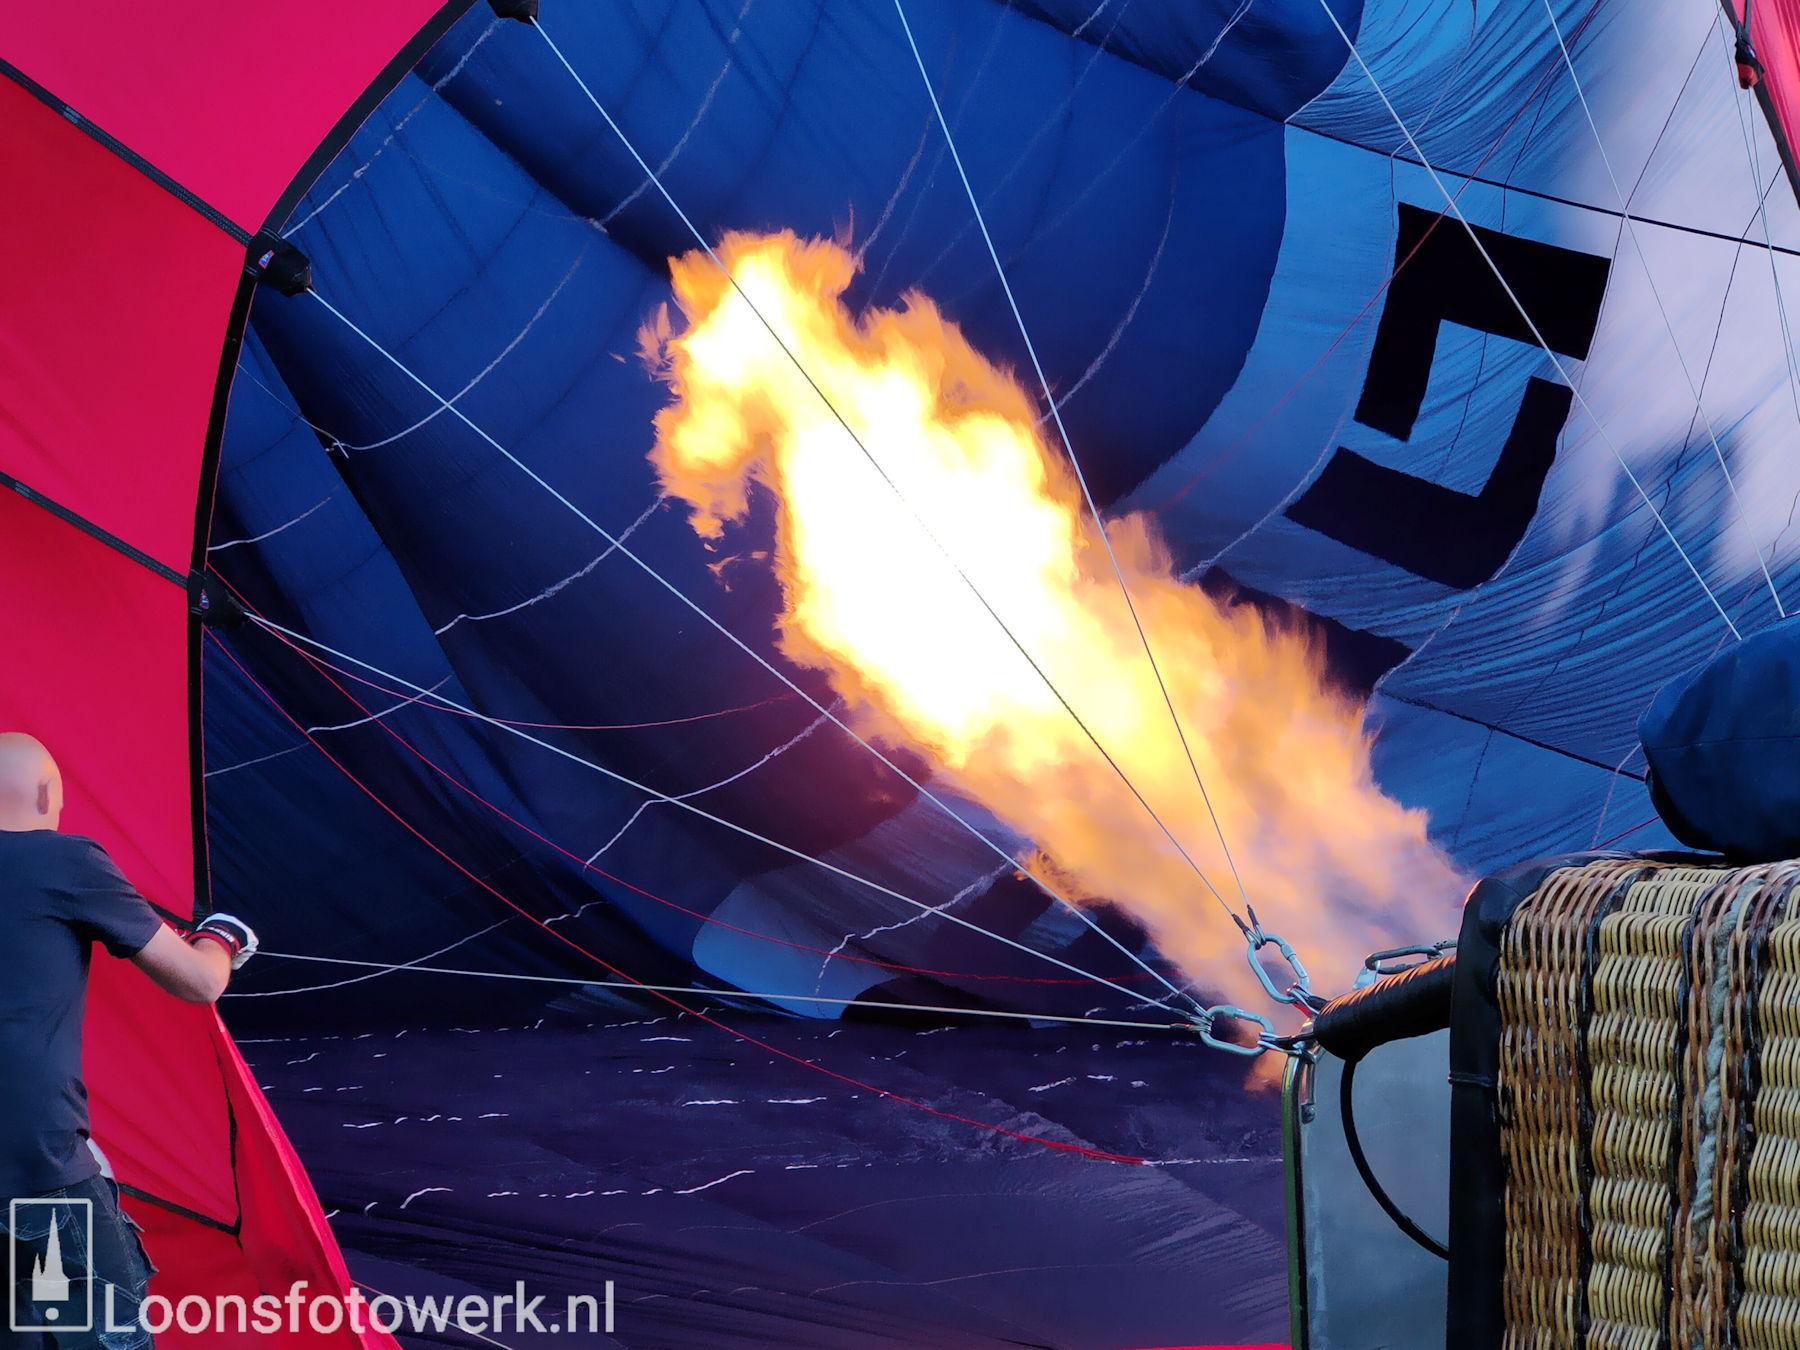 Ballonvaart vanaf de Kasteelweide 19